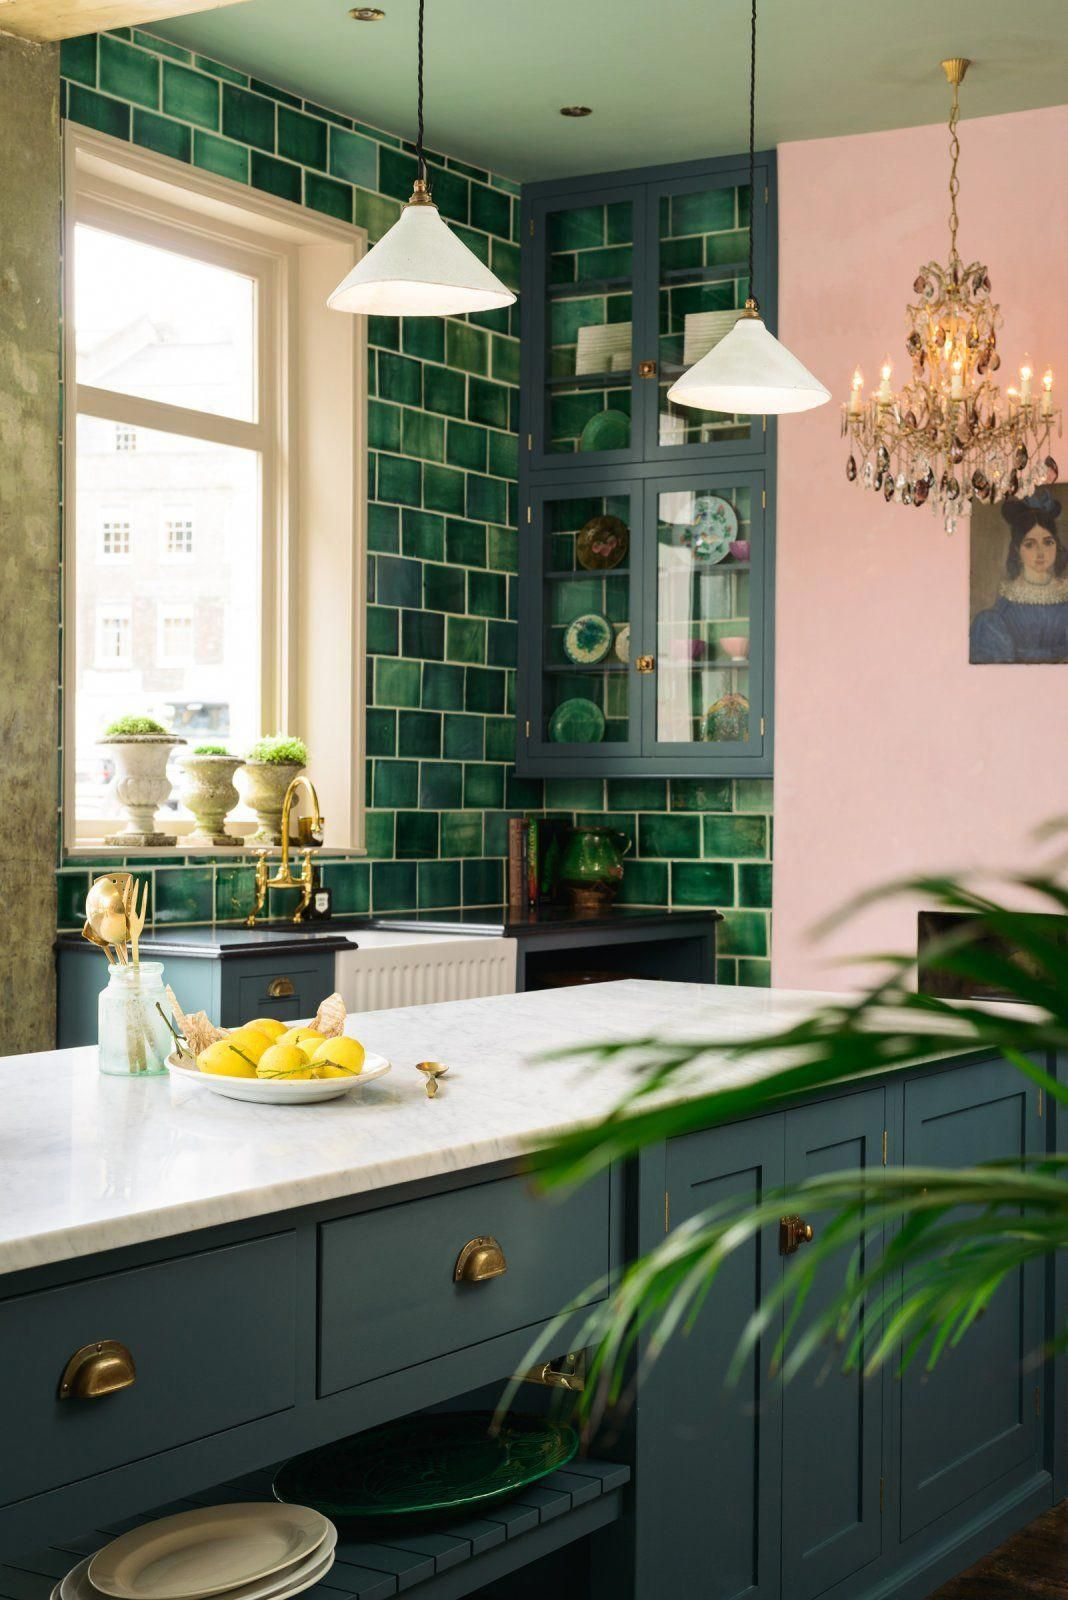 A Pink Green Kitchen Green Kitchen Decor Interior Design Kitchen Kitchen Interior